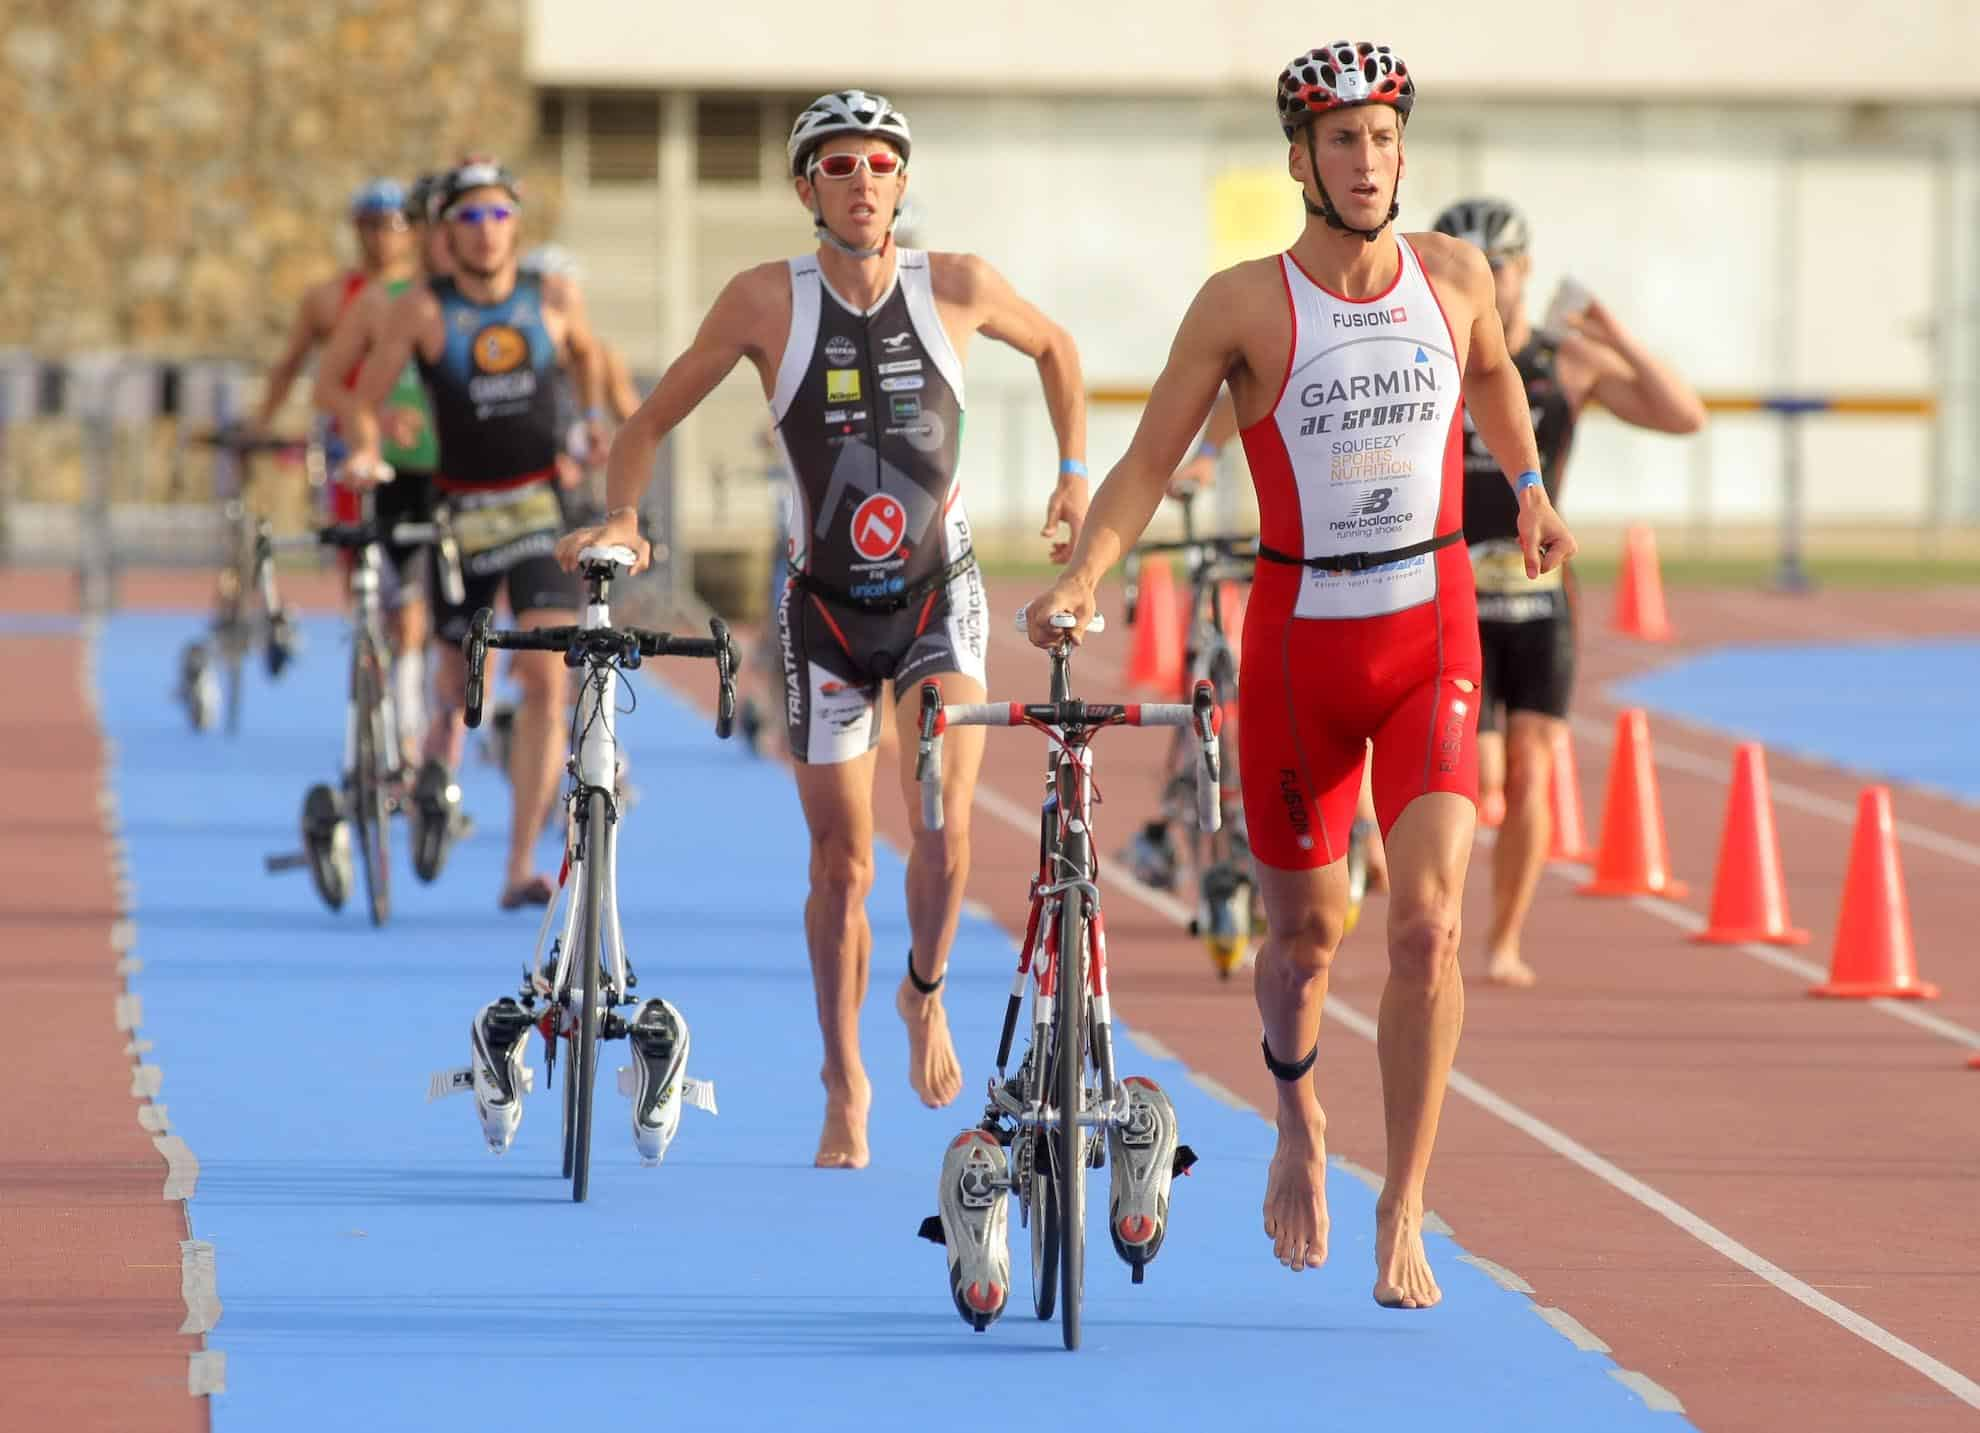 triathlon par equipe de 3